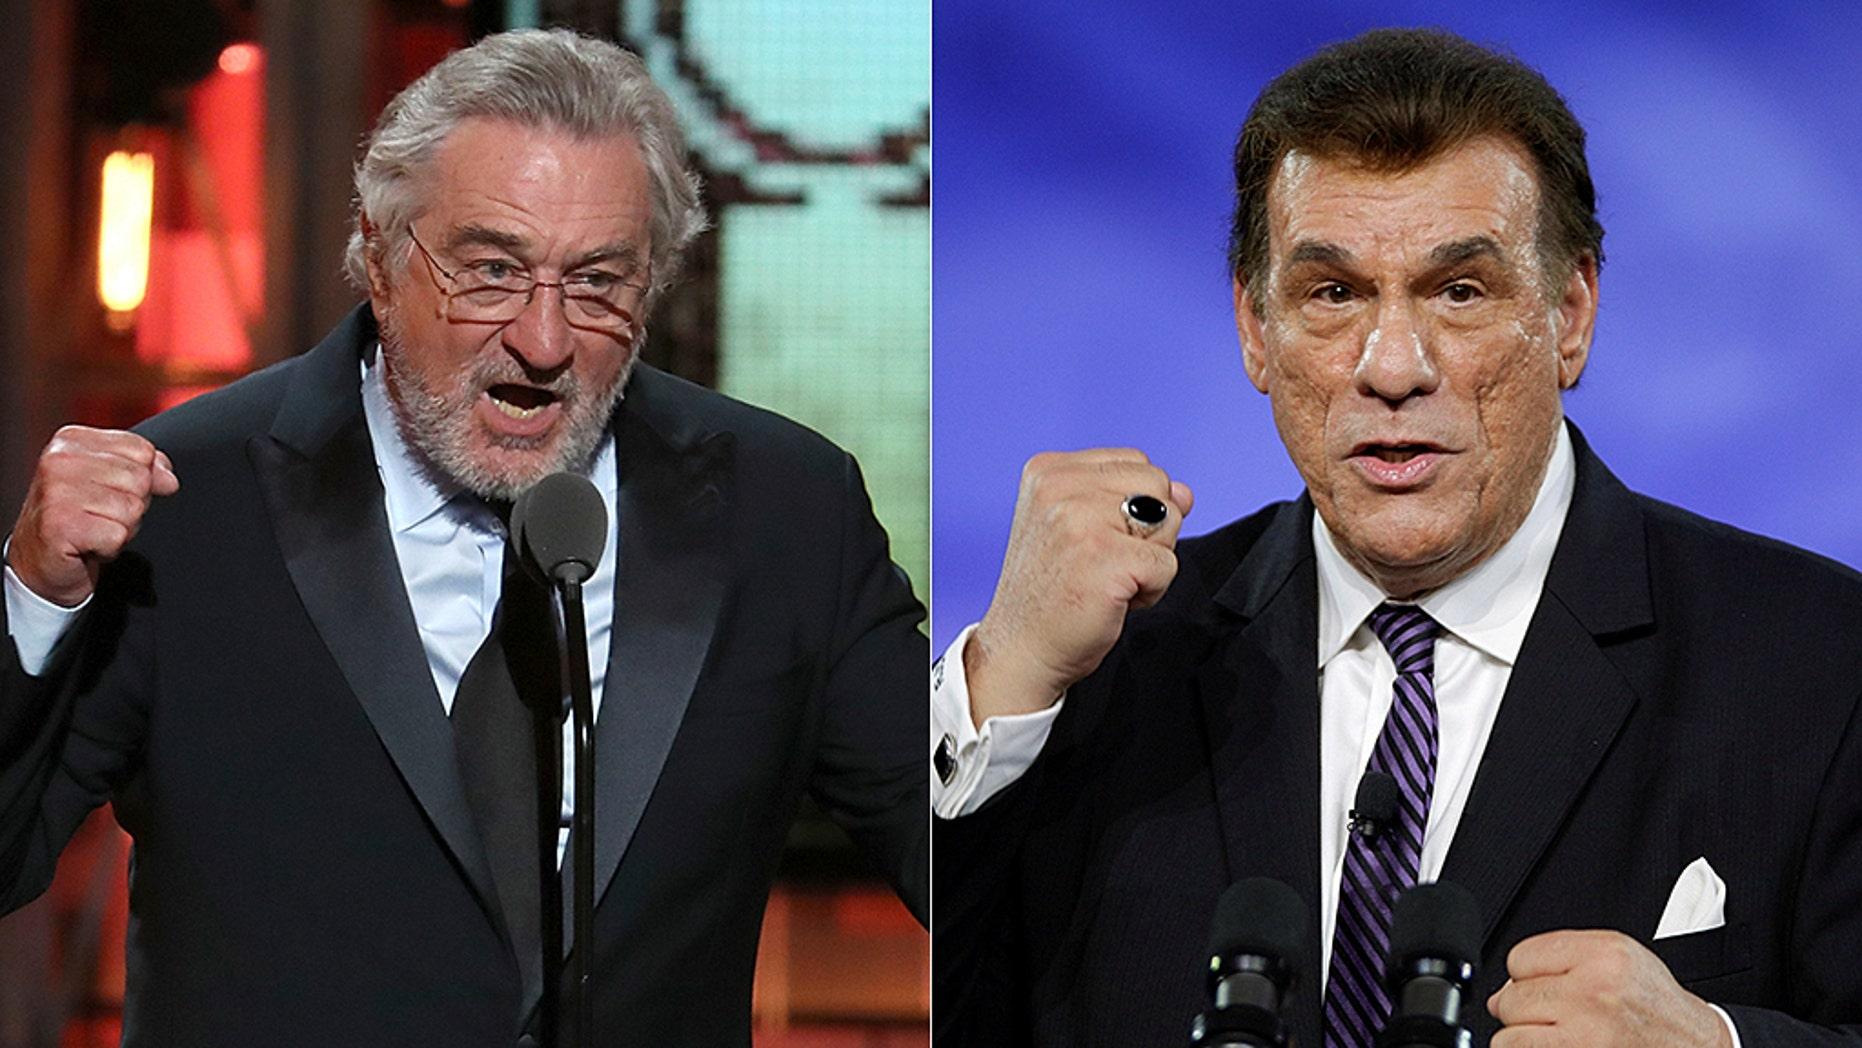 Robert Davi, right, criticized Robert De Niro's, right, speech at the Tony Awards.